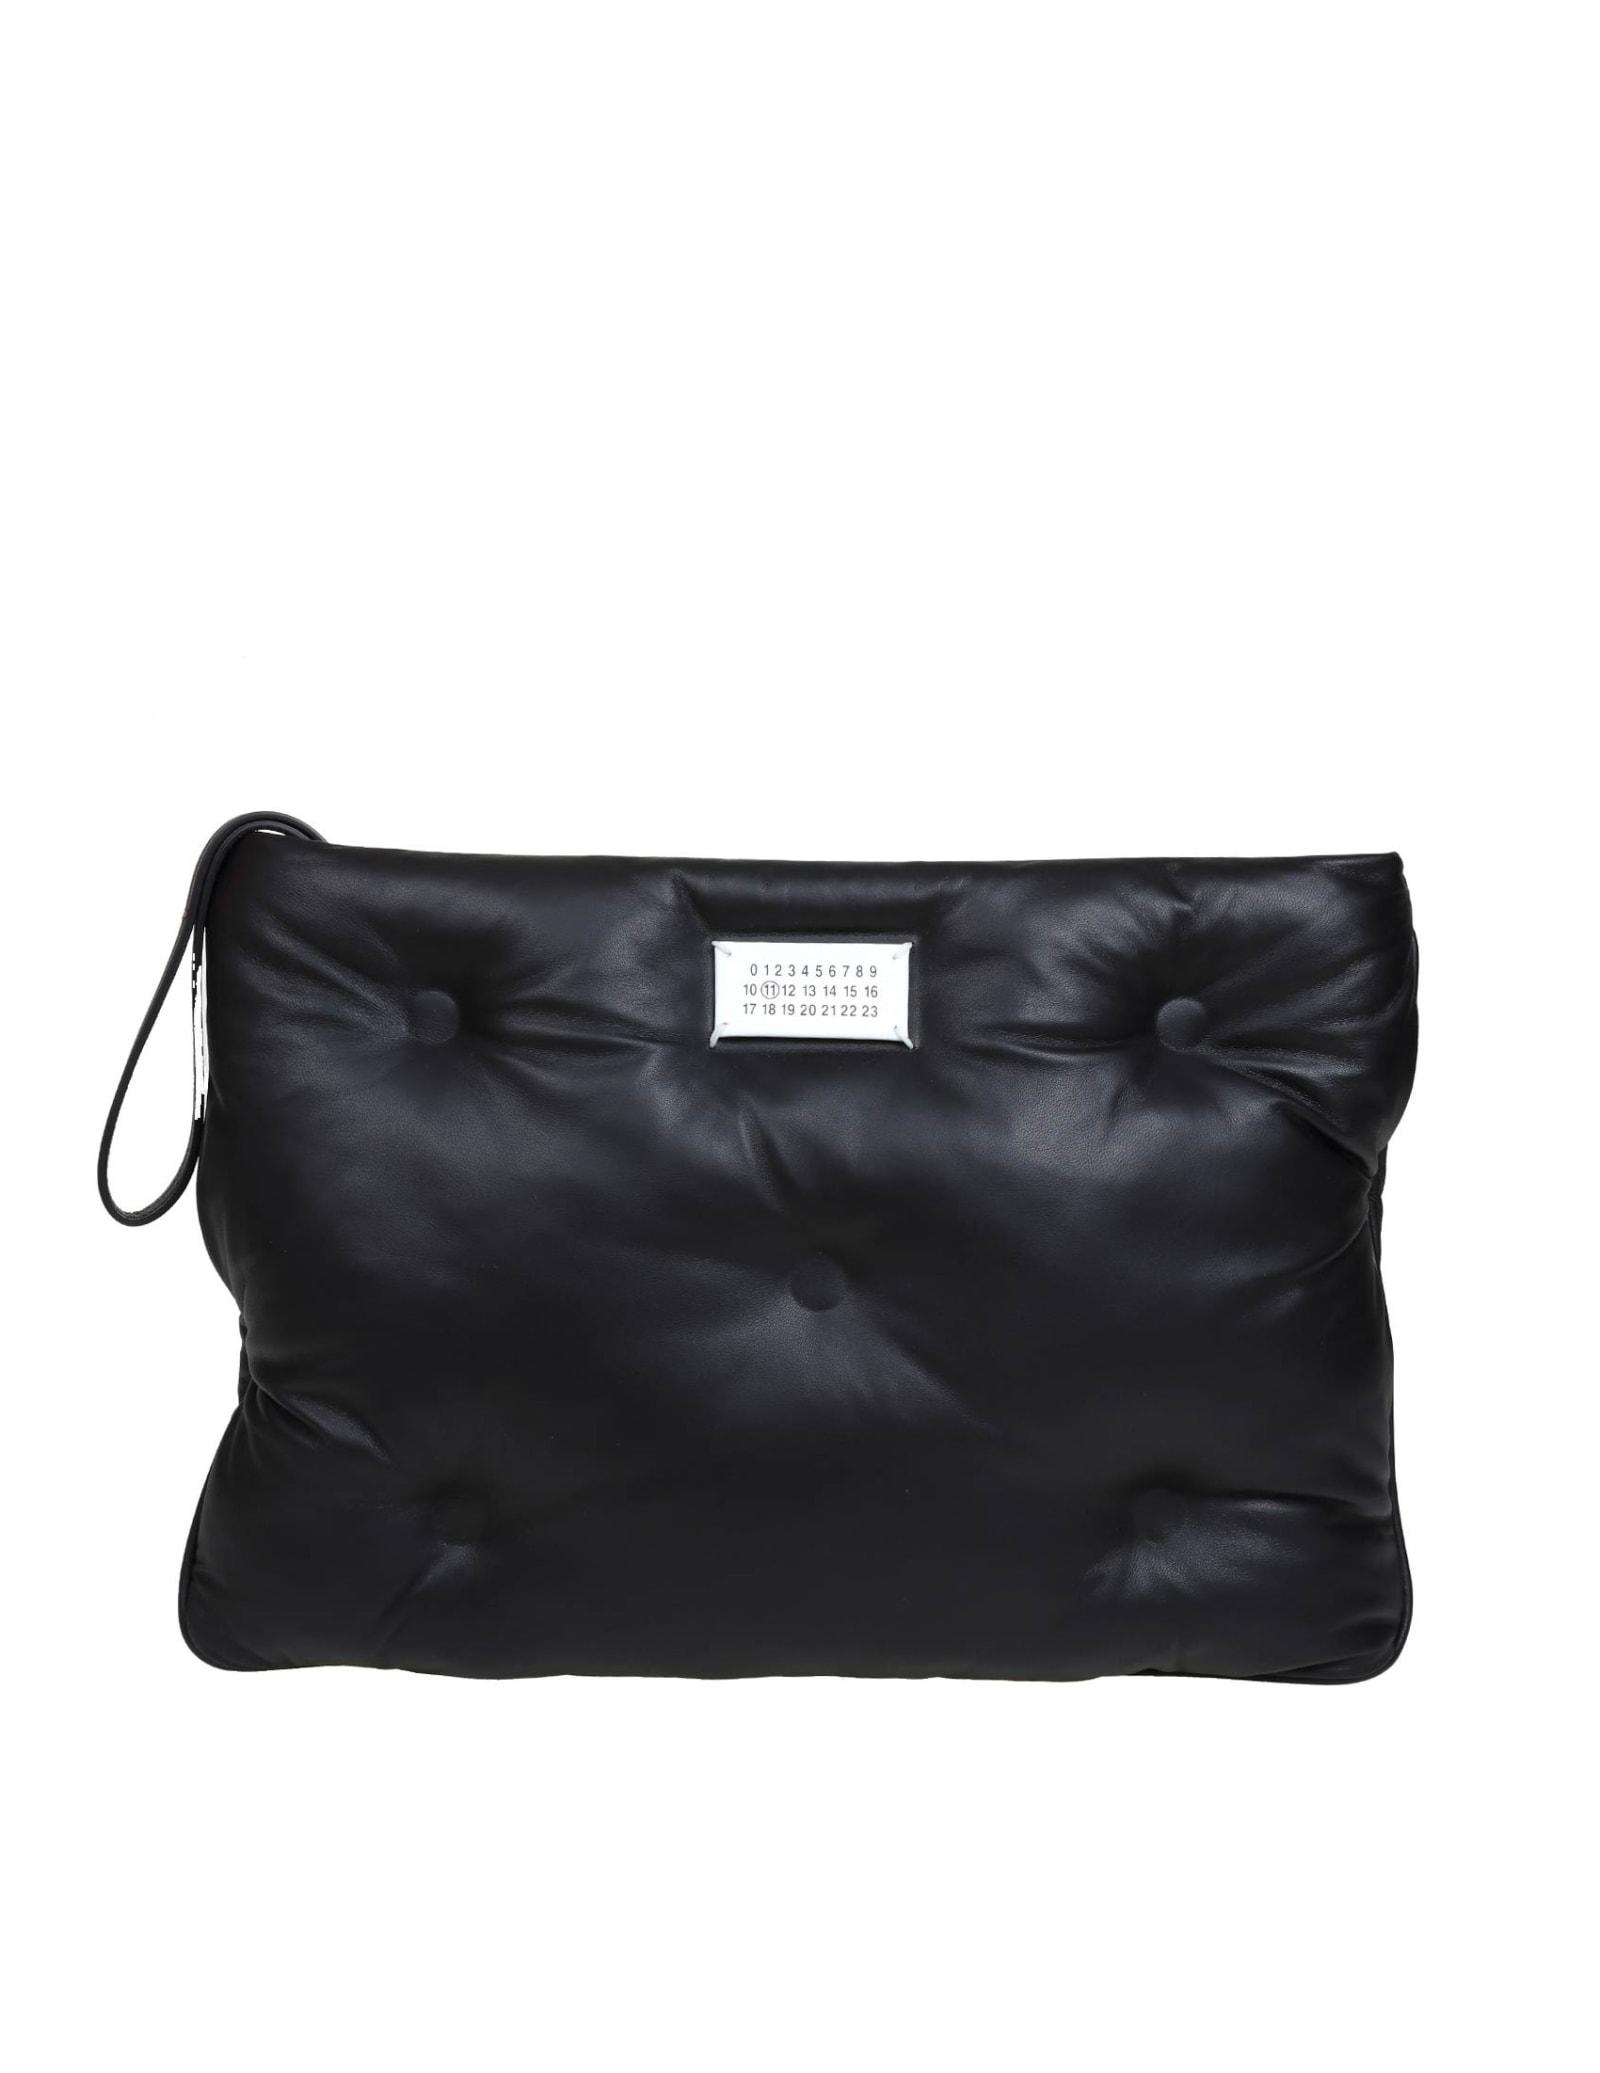 Maison Margiela Clutch Glam S In Black Leather